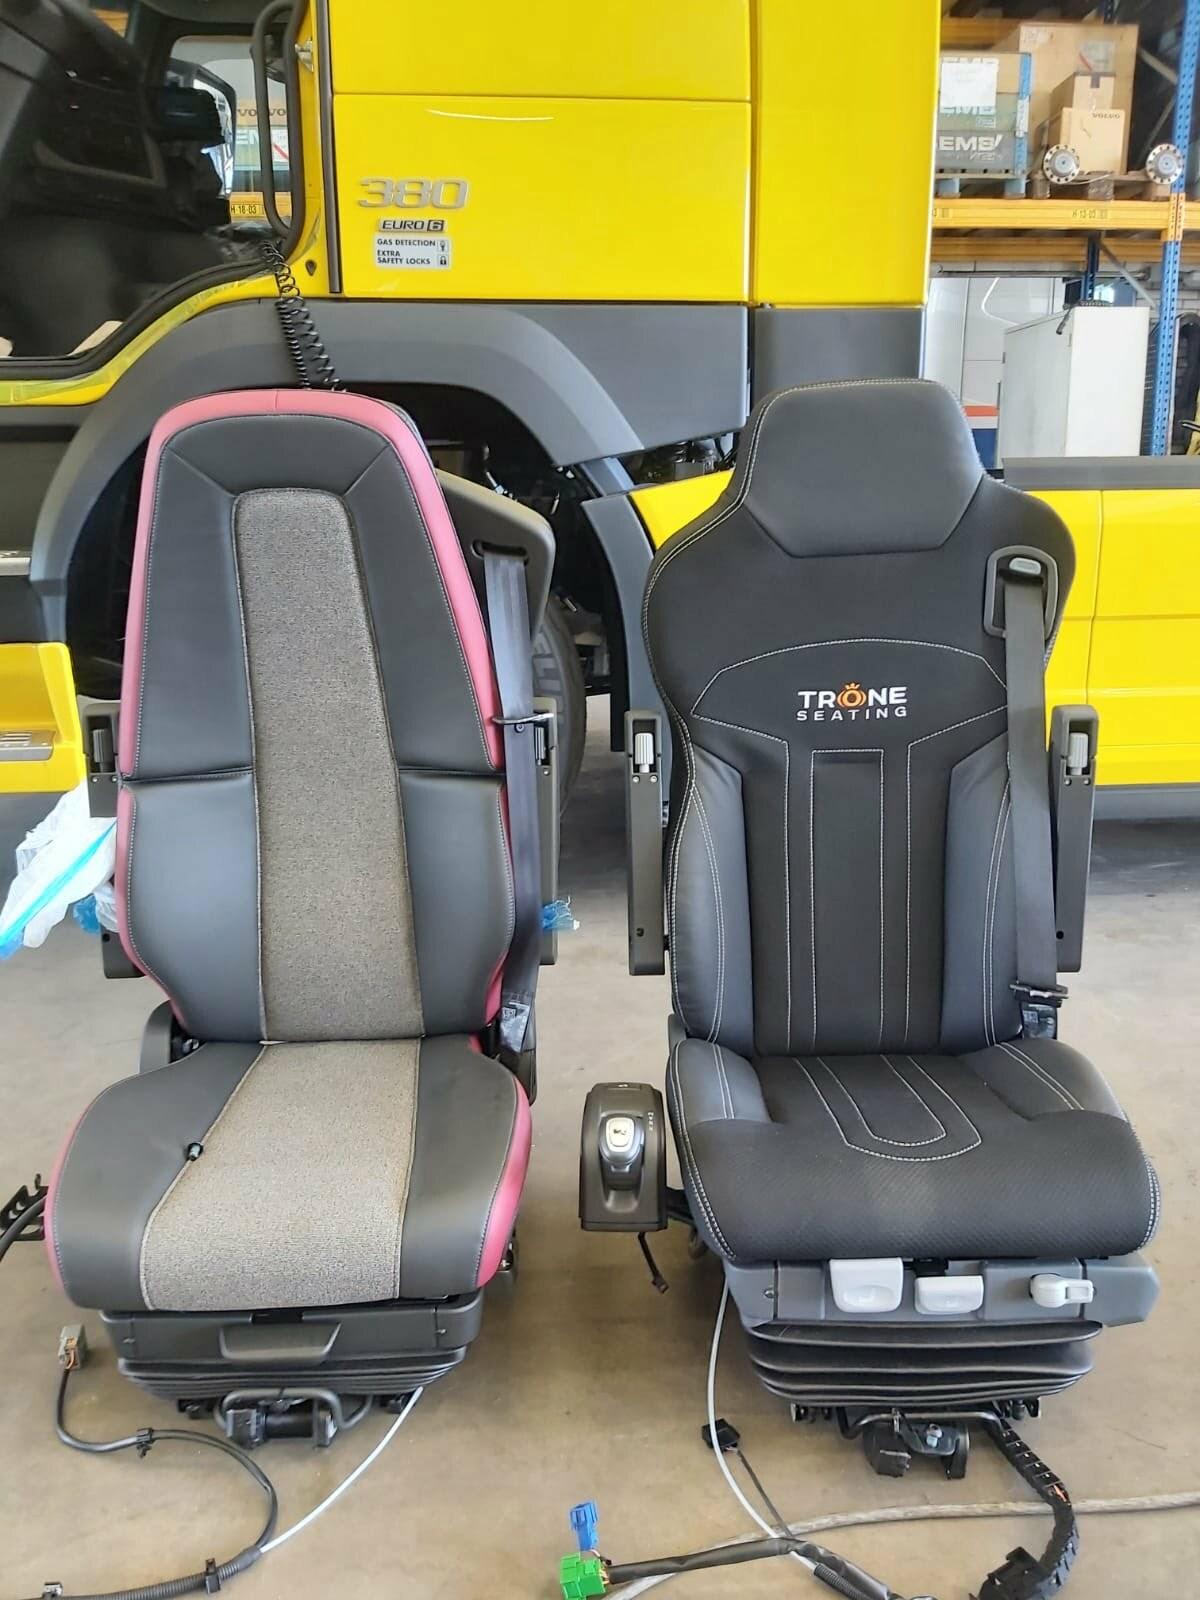 Trone-Seating-VAR-Volvo-chauffeursstoel